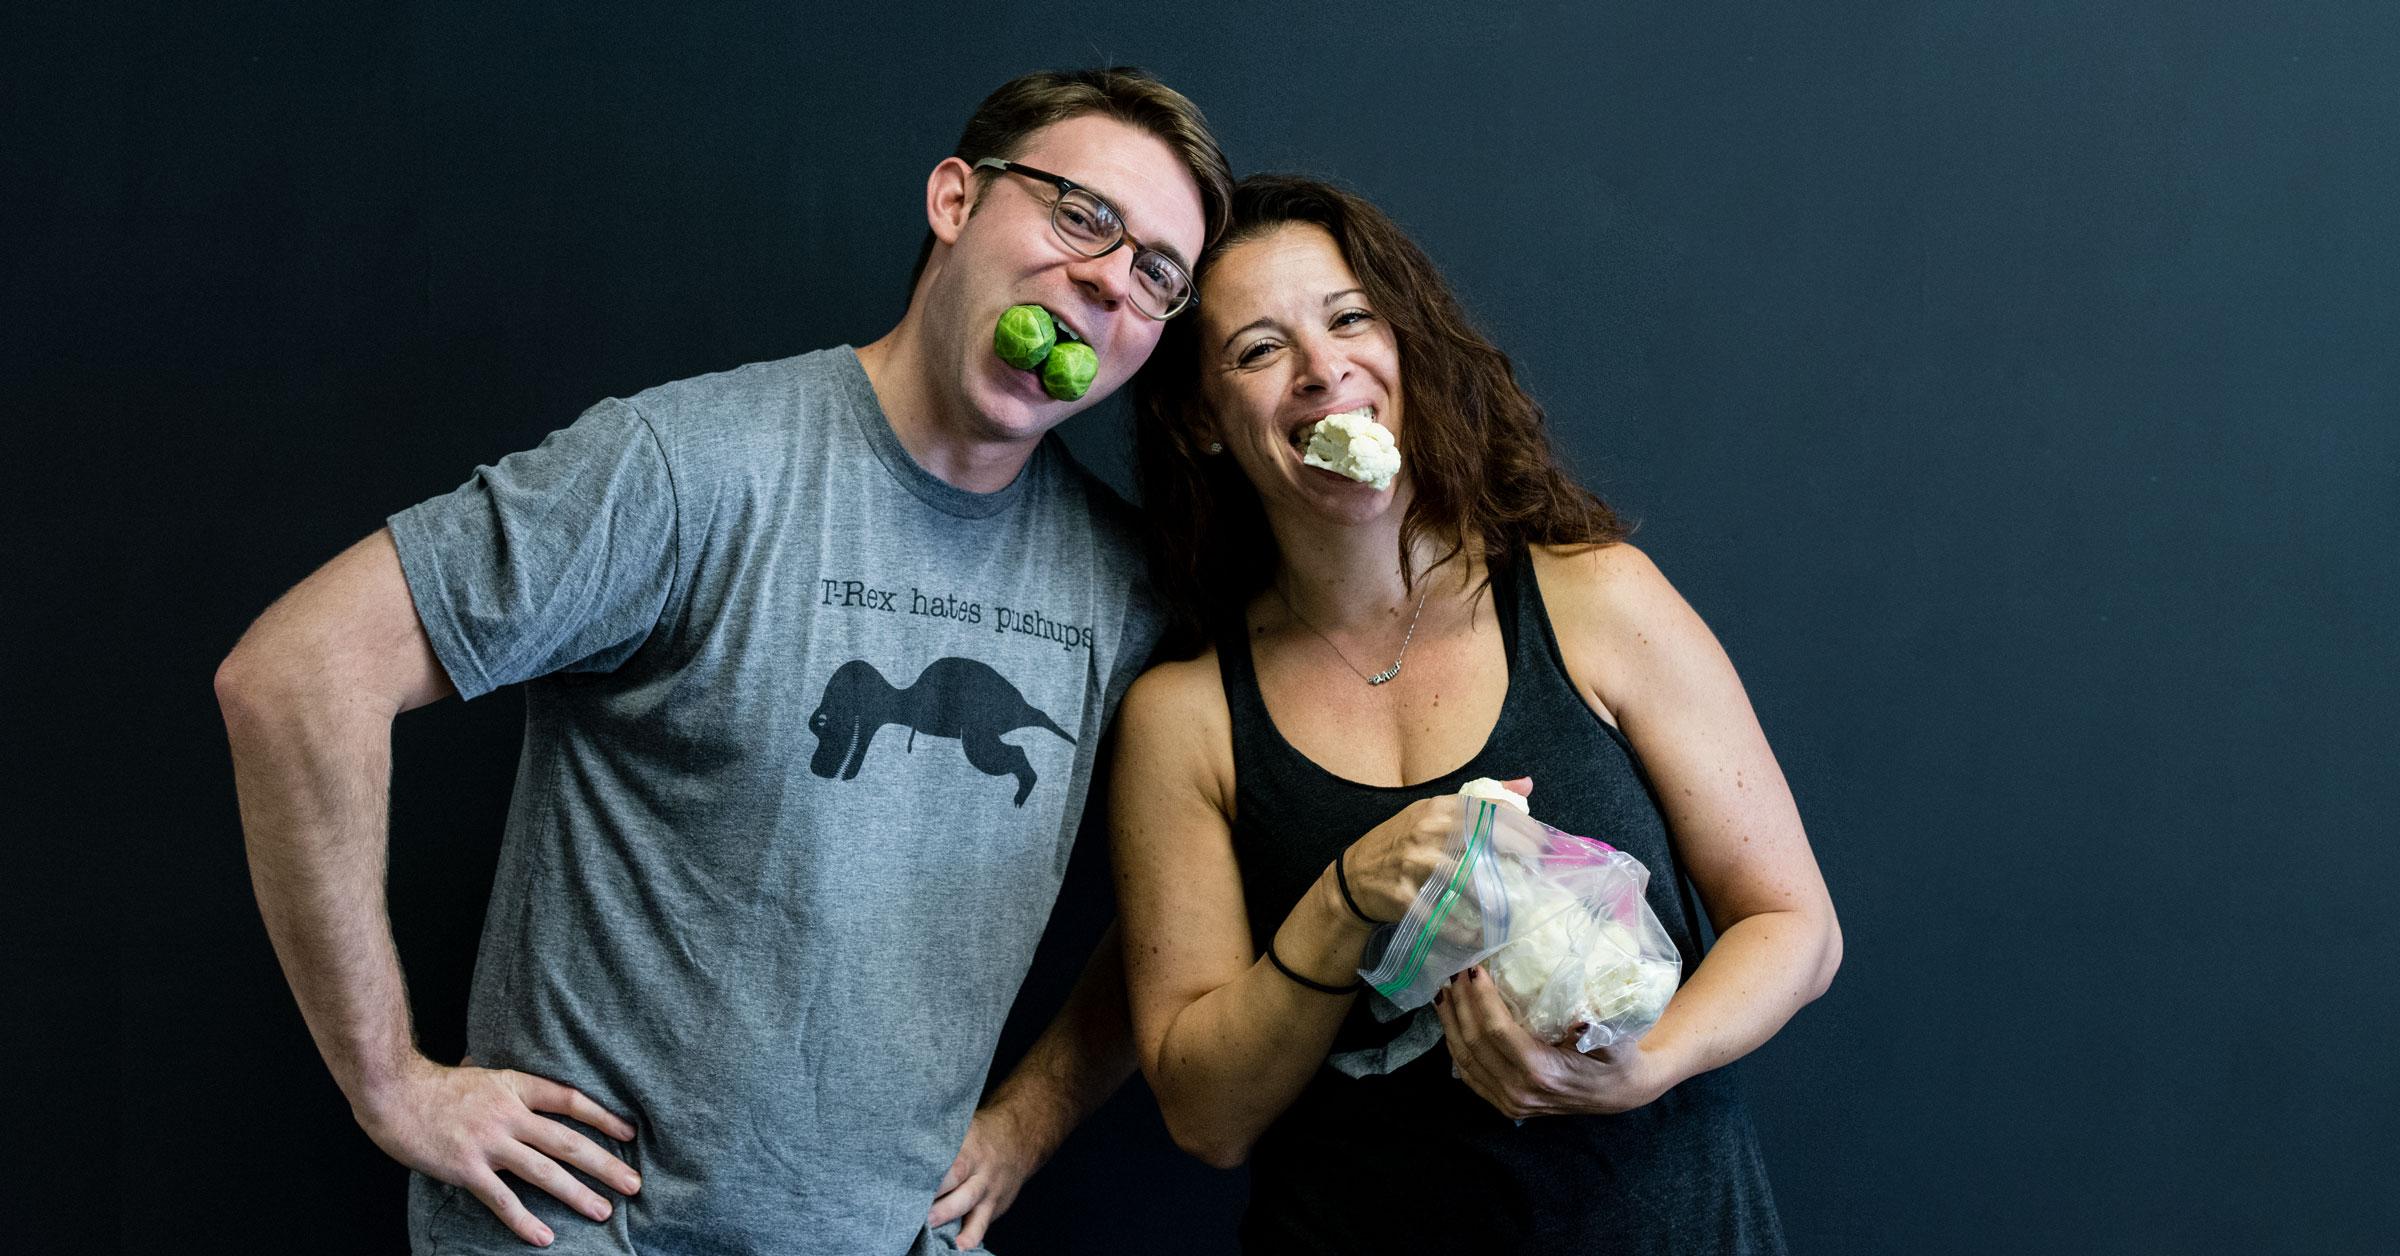 results-driven-Mike-Francine-eating-veggies-facebook-ad.jpg